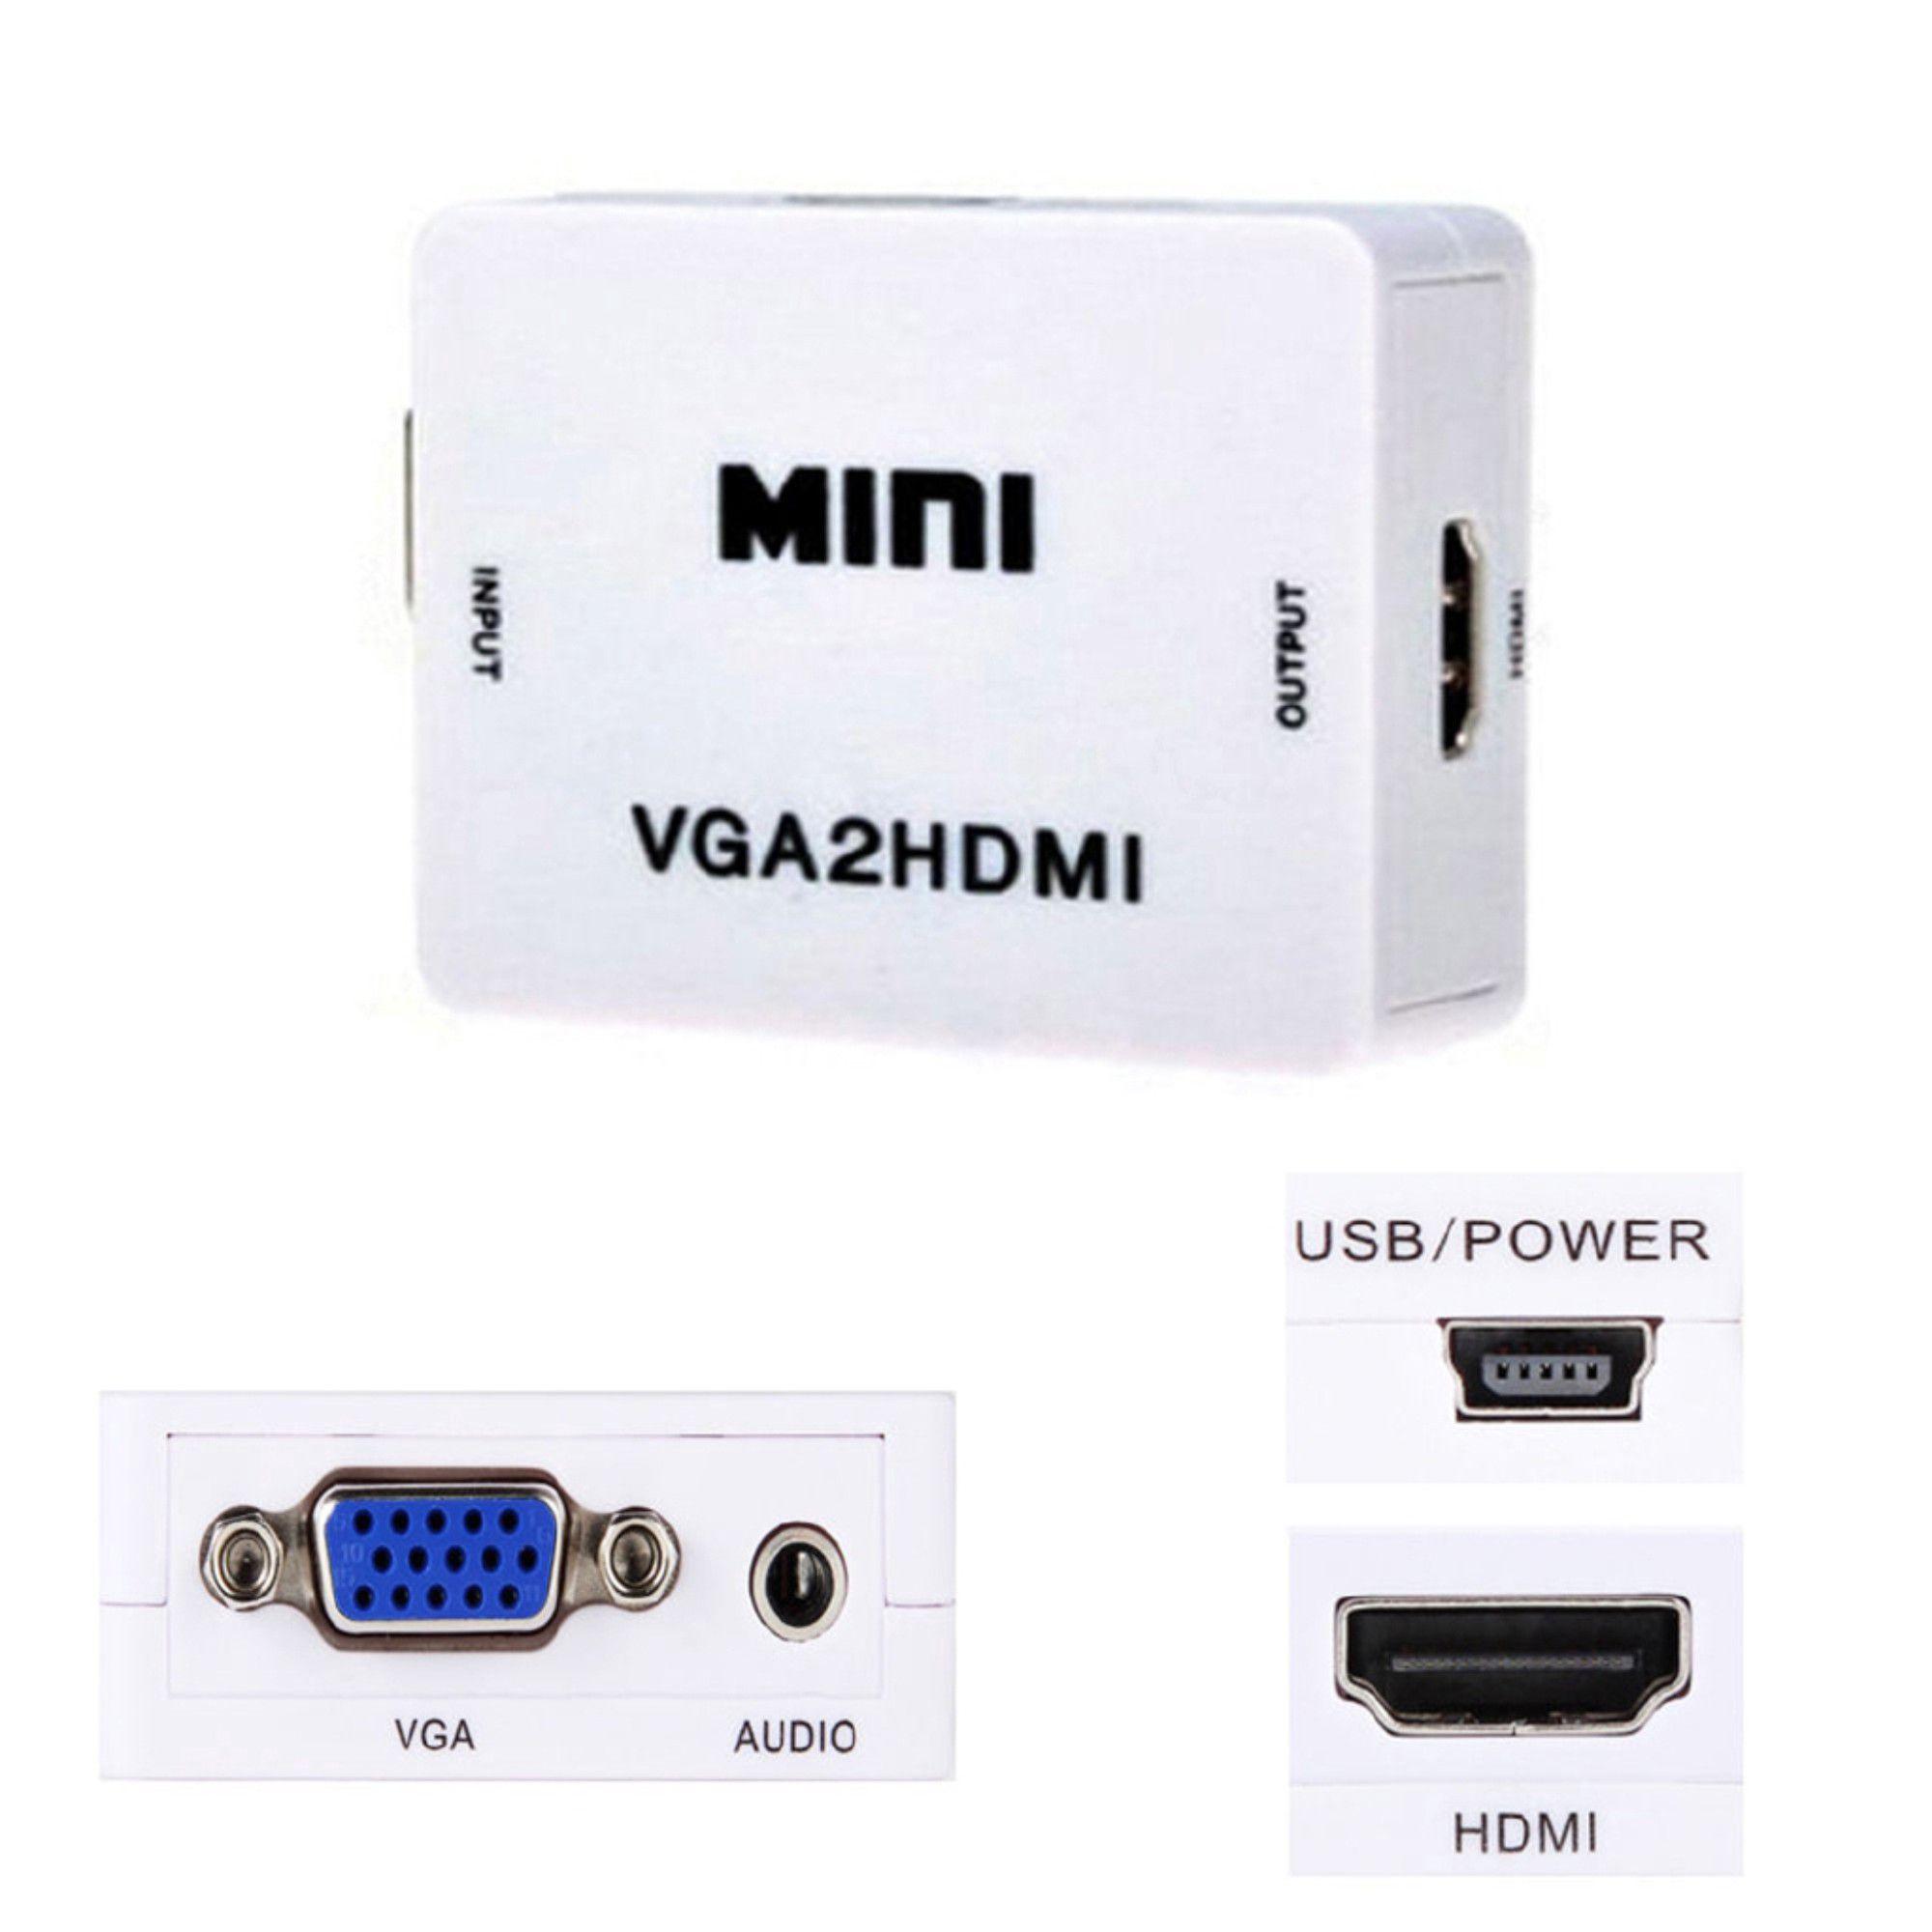 Conversor VGA X HDMI 1080p Full HD VGA2HDMI